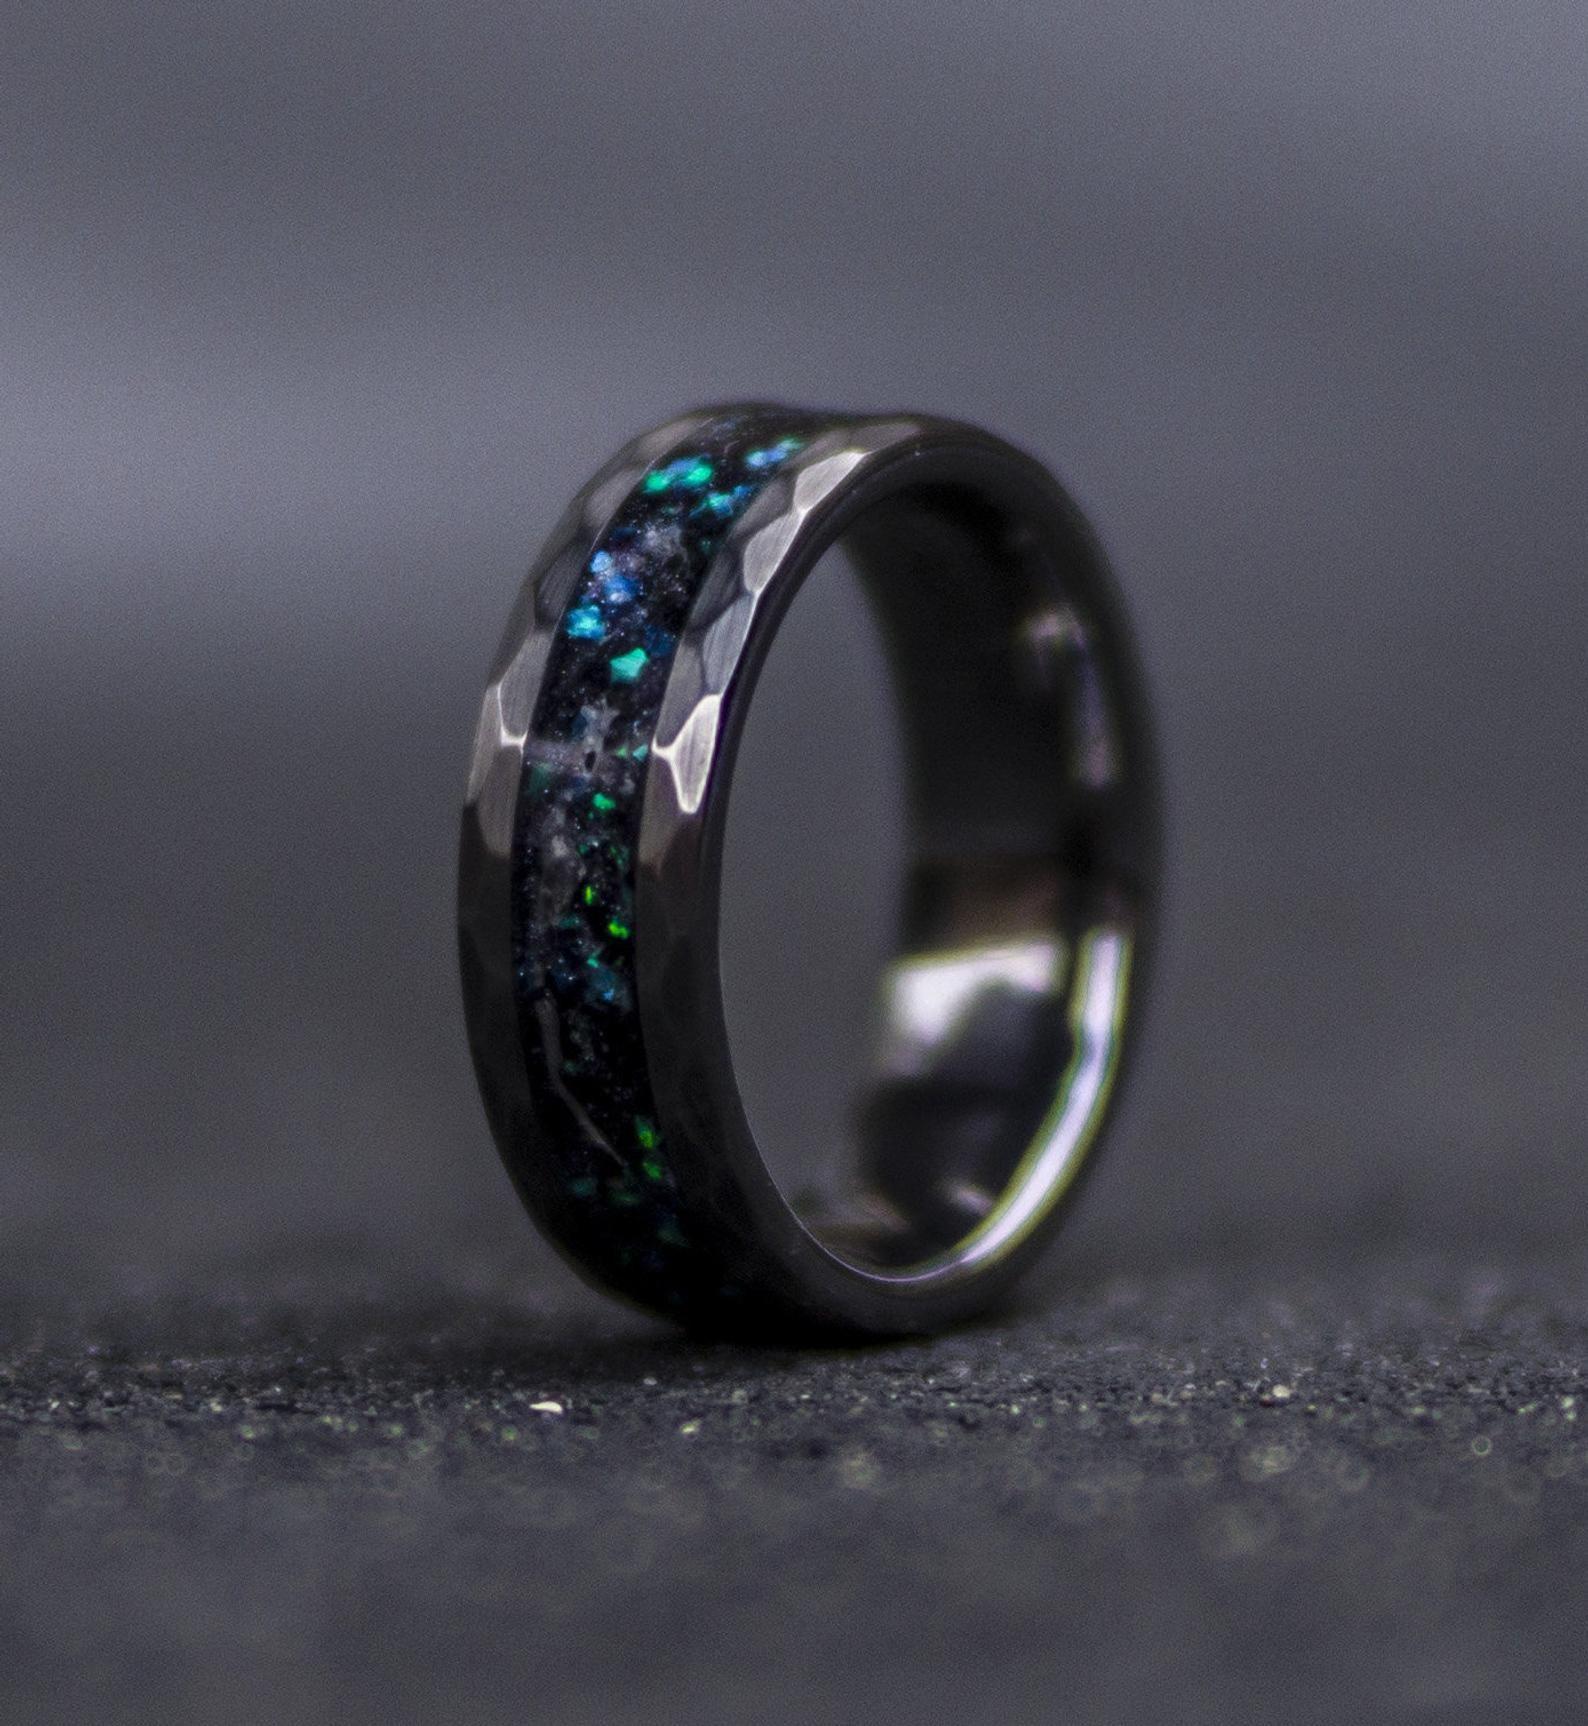 Sale Mens Opal Ring Galaxy Opal Tungsten Ring For Men Meteorite Opal Ring Hammered Wedding Band Men Ring With Opal Inlay In 2020 Rings For Men Tungsten Mens Rings Opal Rings